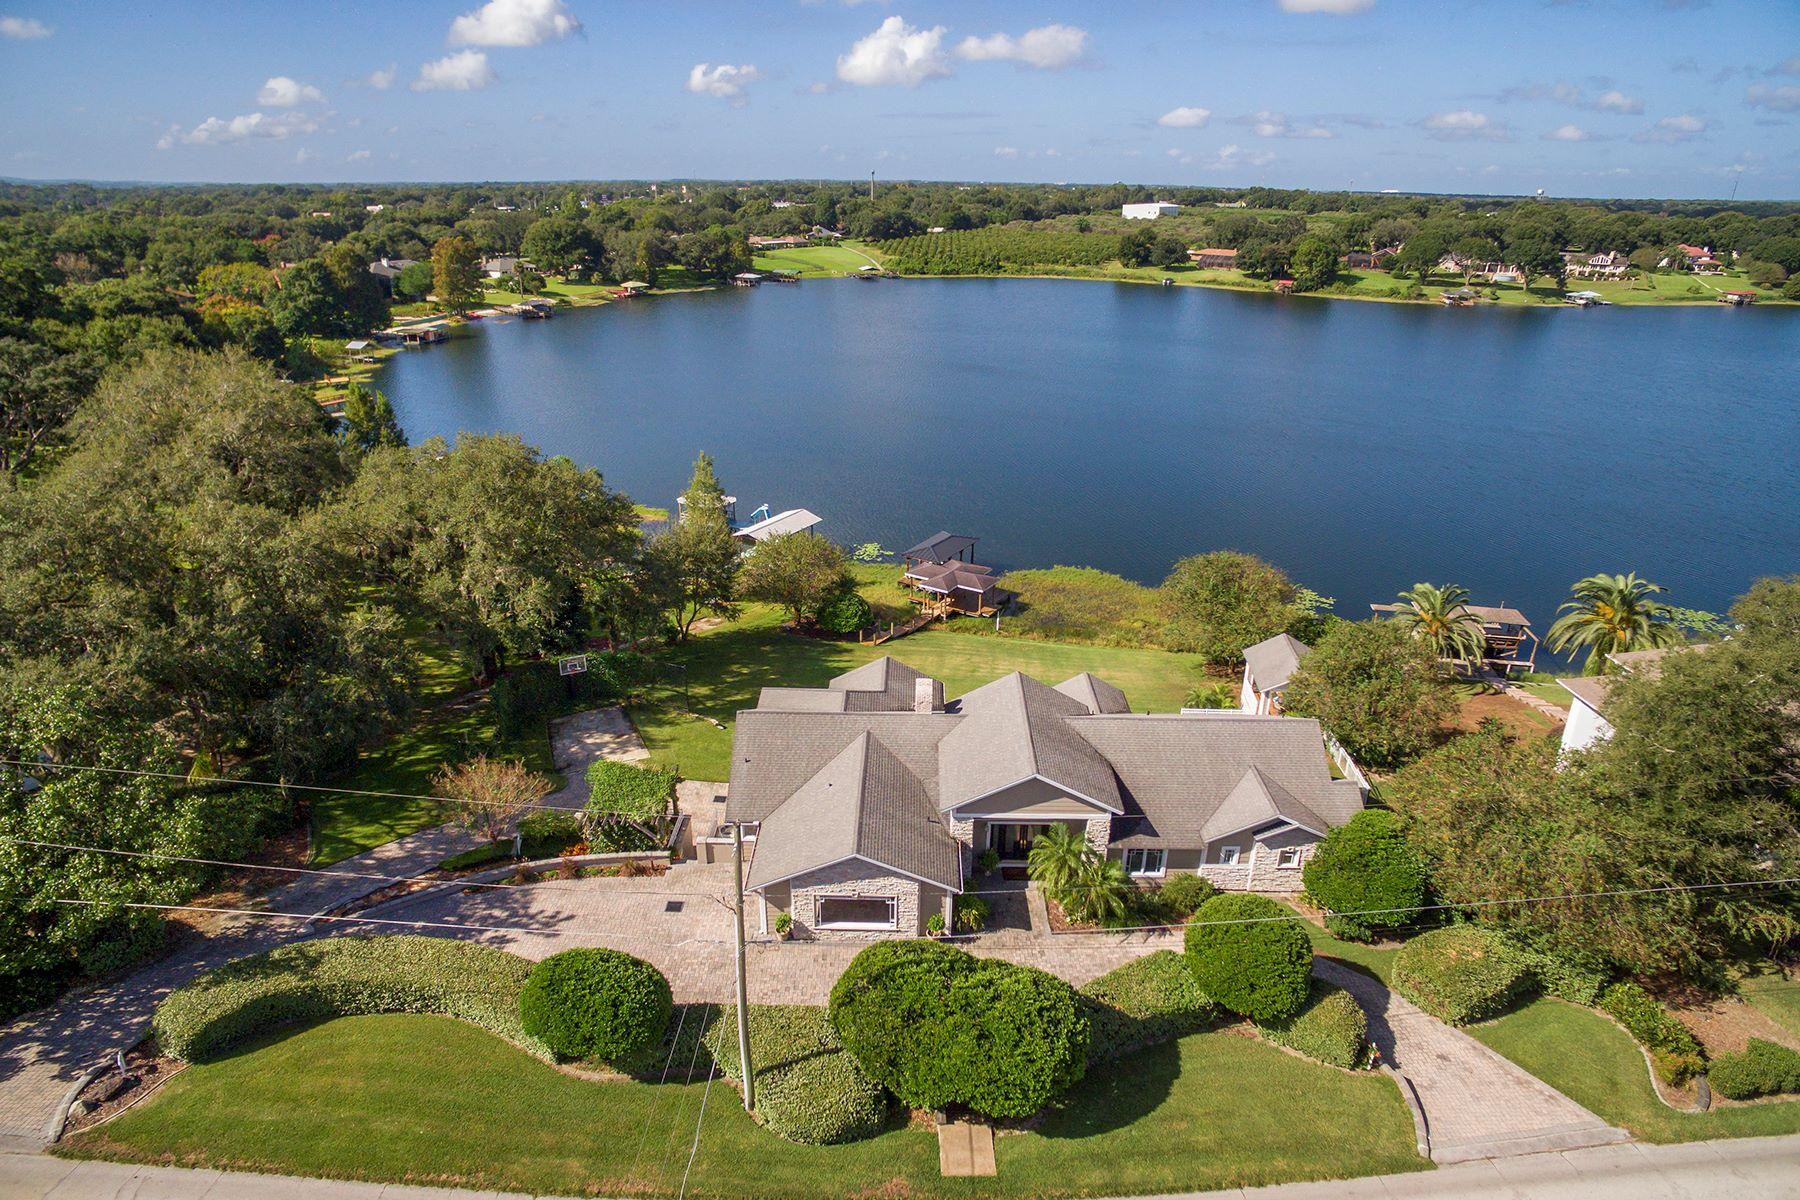 Single Family Home for Sale at EUSTIS - FLORIDA 2790 E Crooked Lake Dr Eustis, Florida, 32726 United States